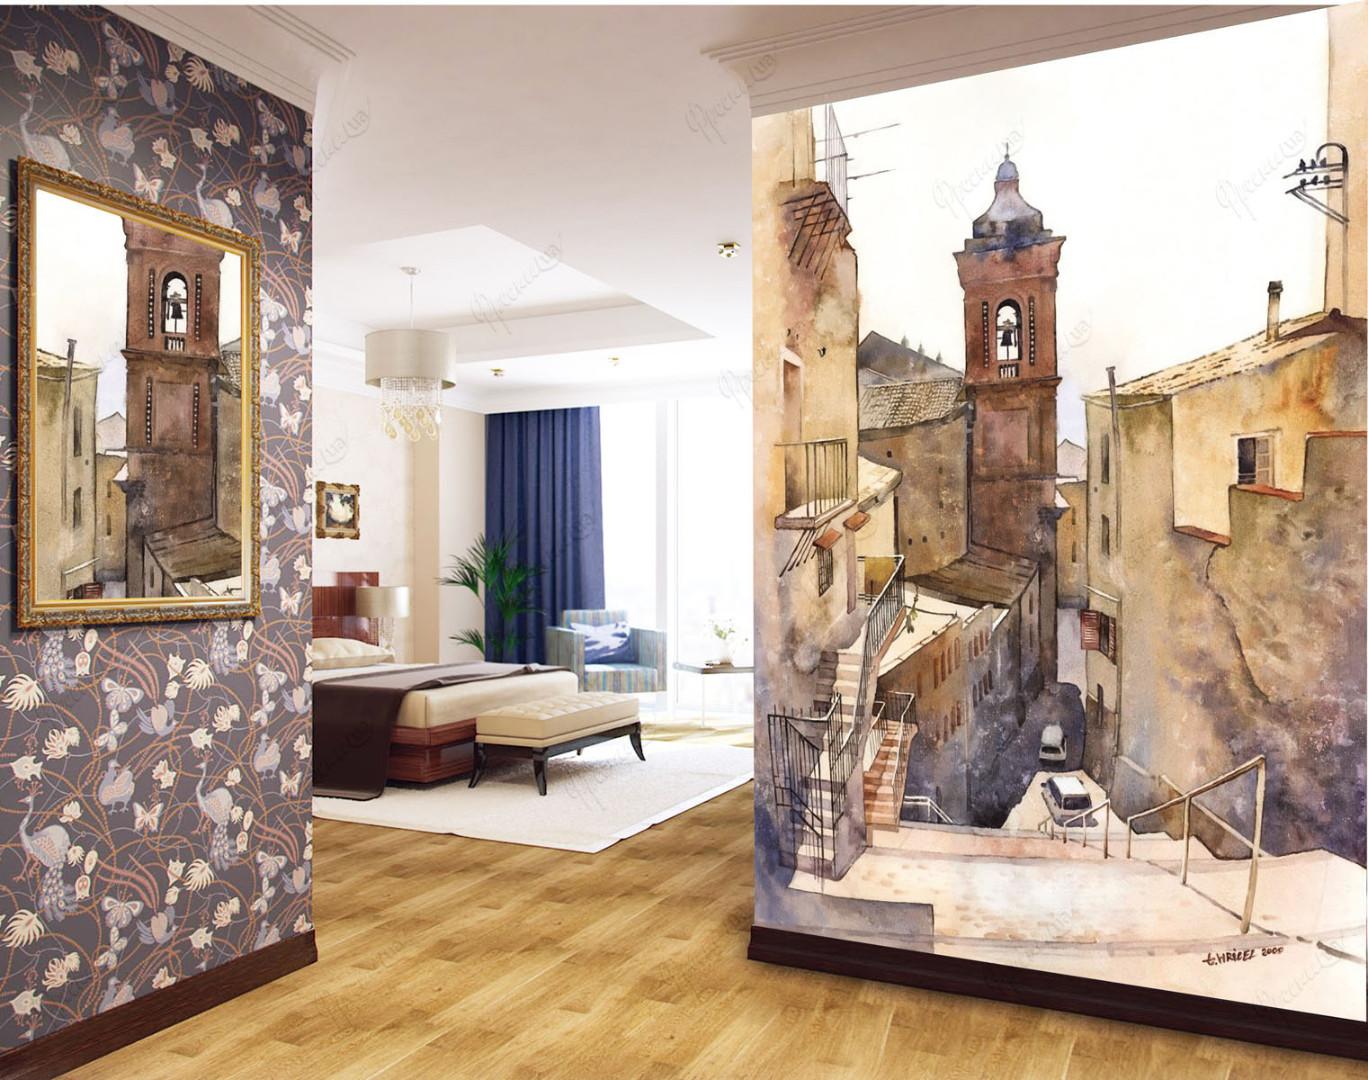 сожалению, иногда фрески на стене в квартире фото оборота банкноты